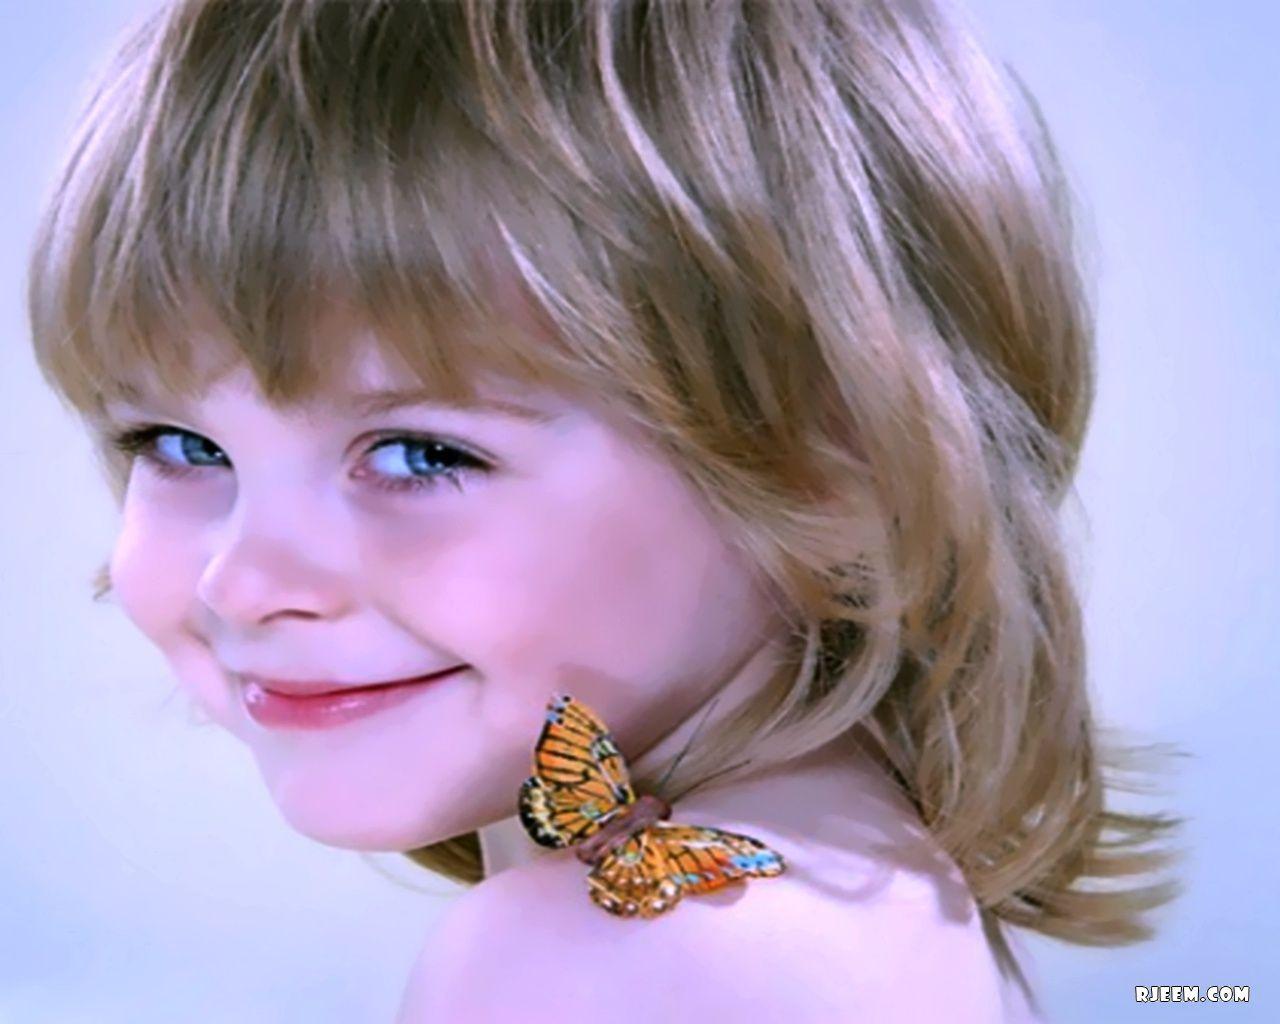 صور اطفال تبتسم جميلة بنات واولاد صغار Fashion Baby Pictures Earrings